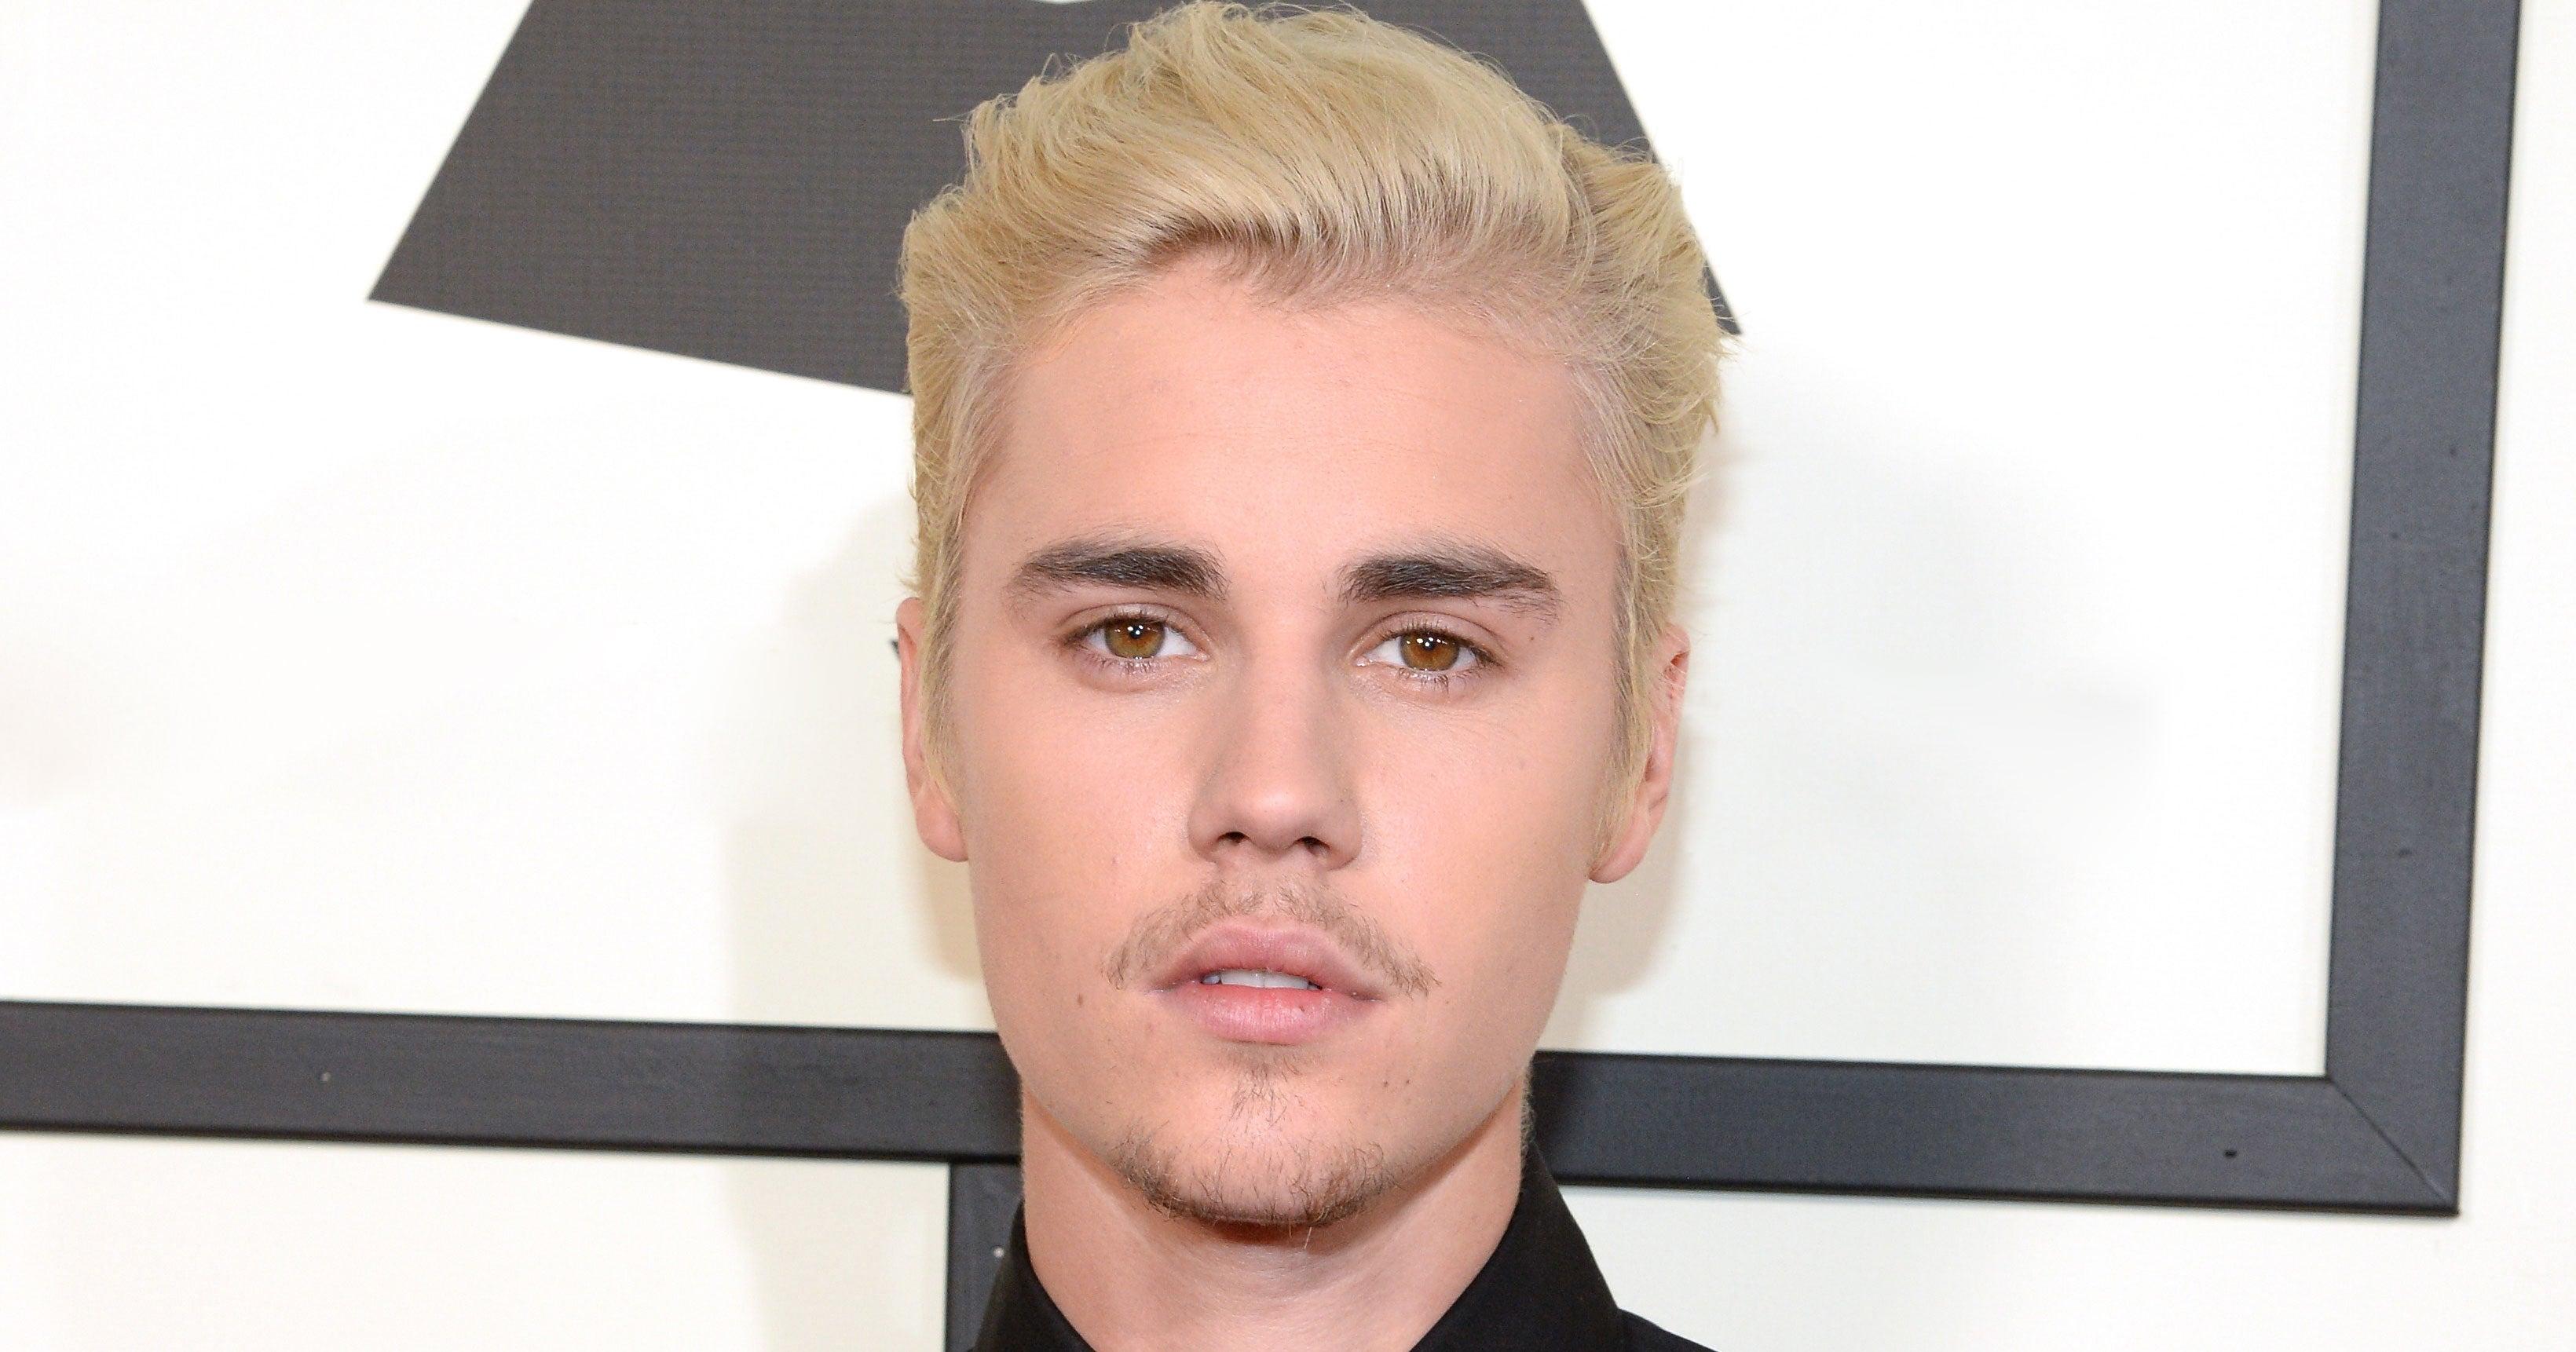 Justin Bieber Got A Massive Neck Tattoo That Matches Hailey's